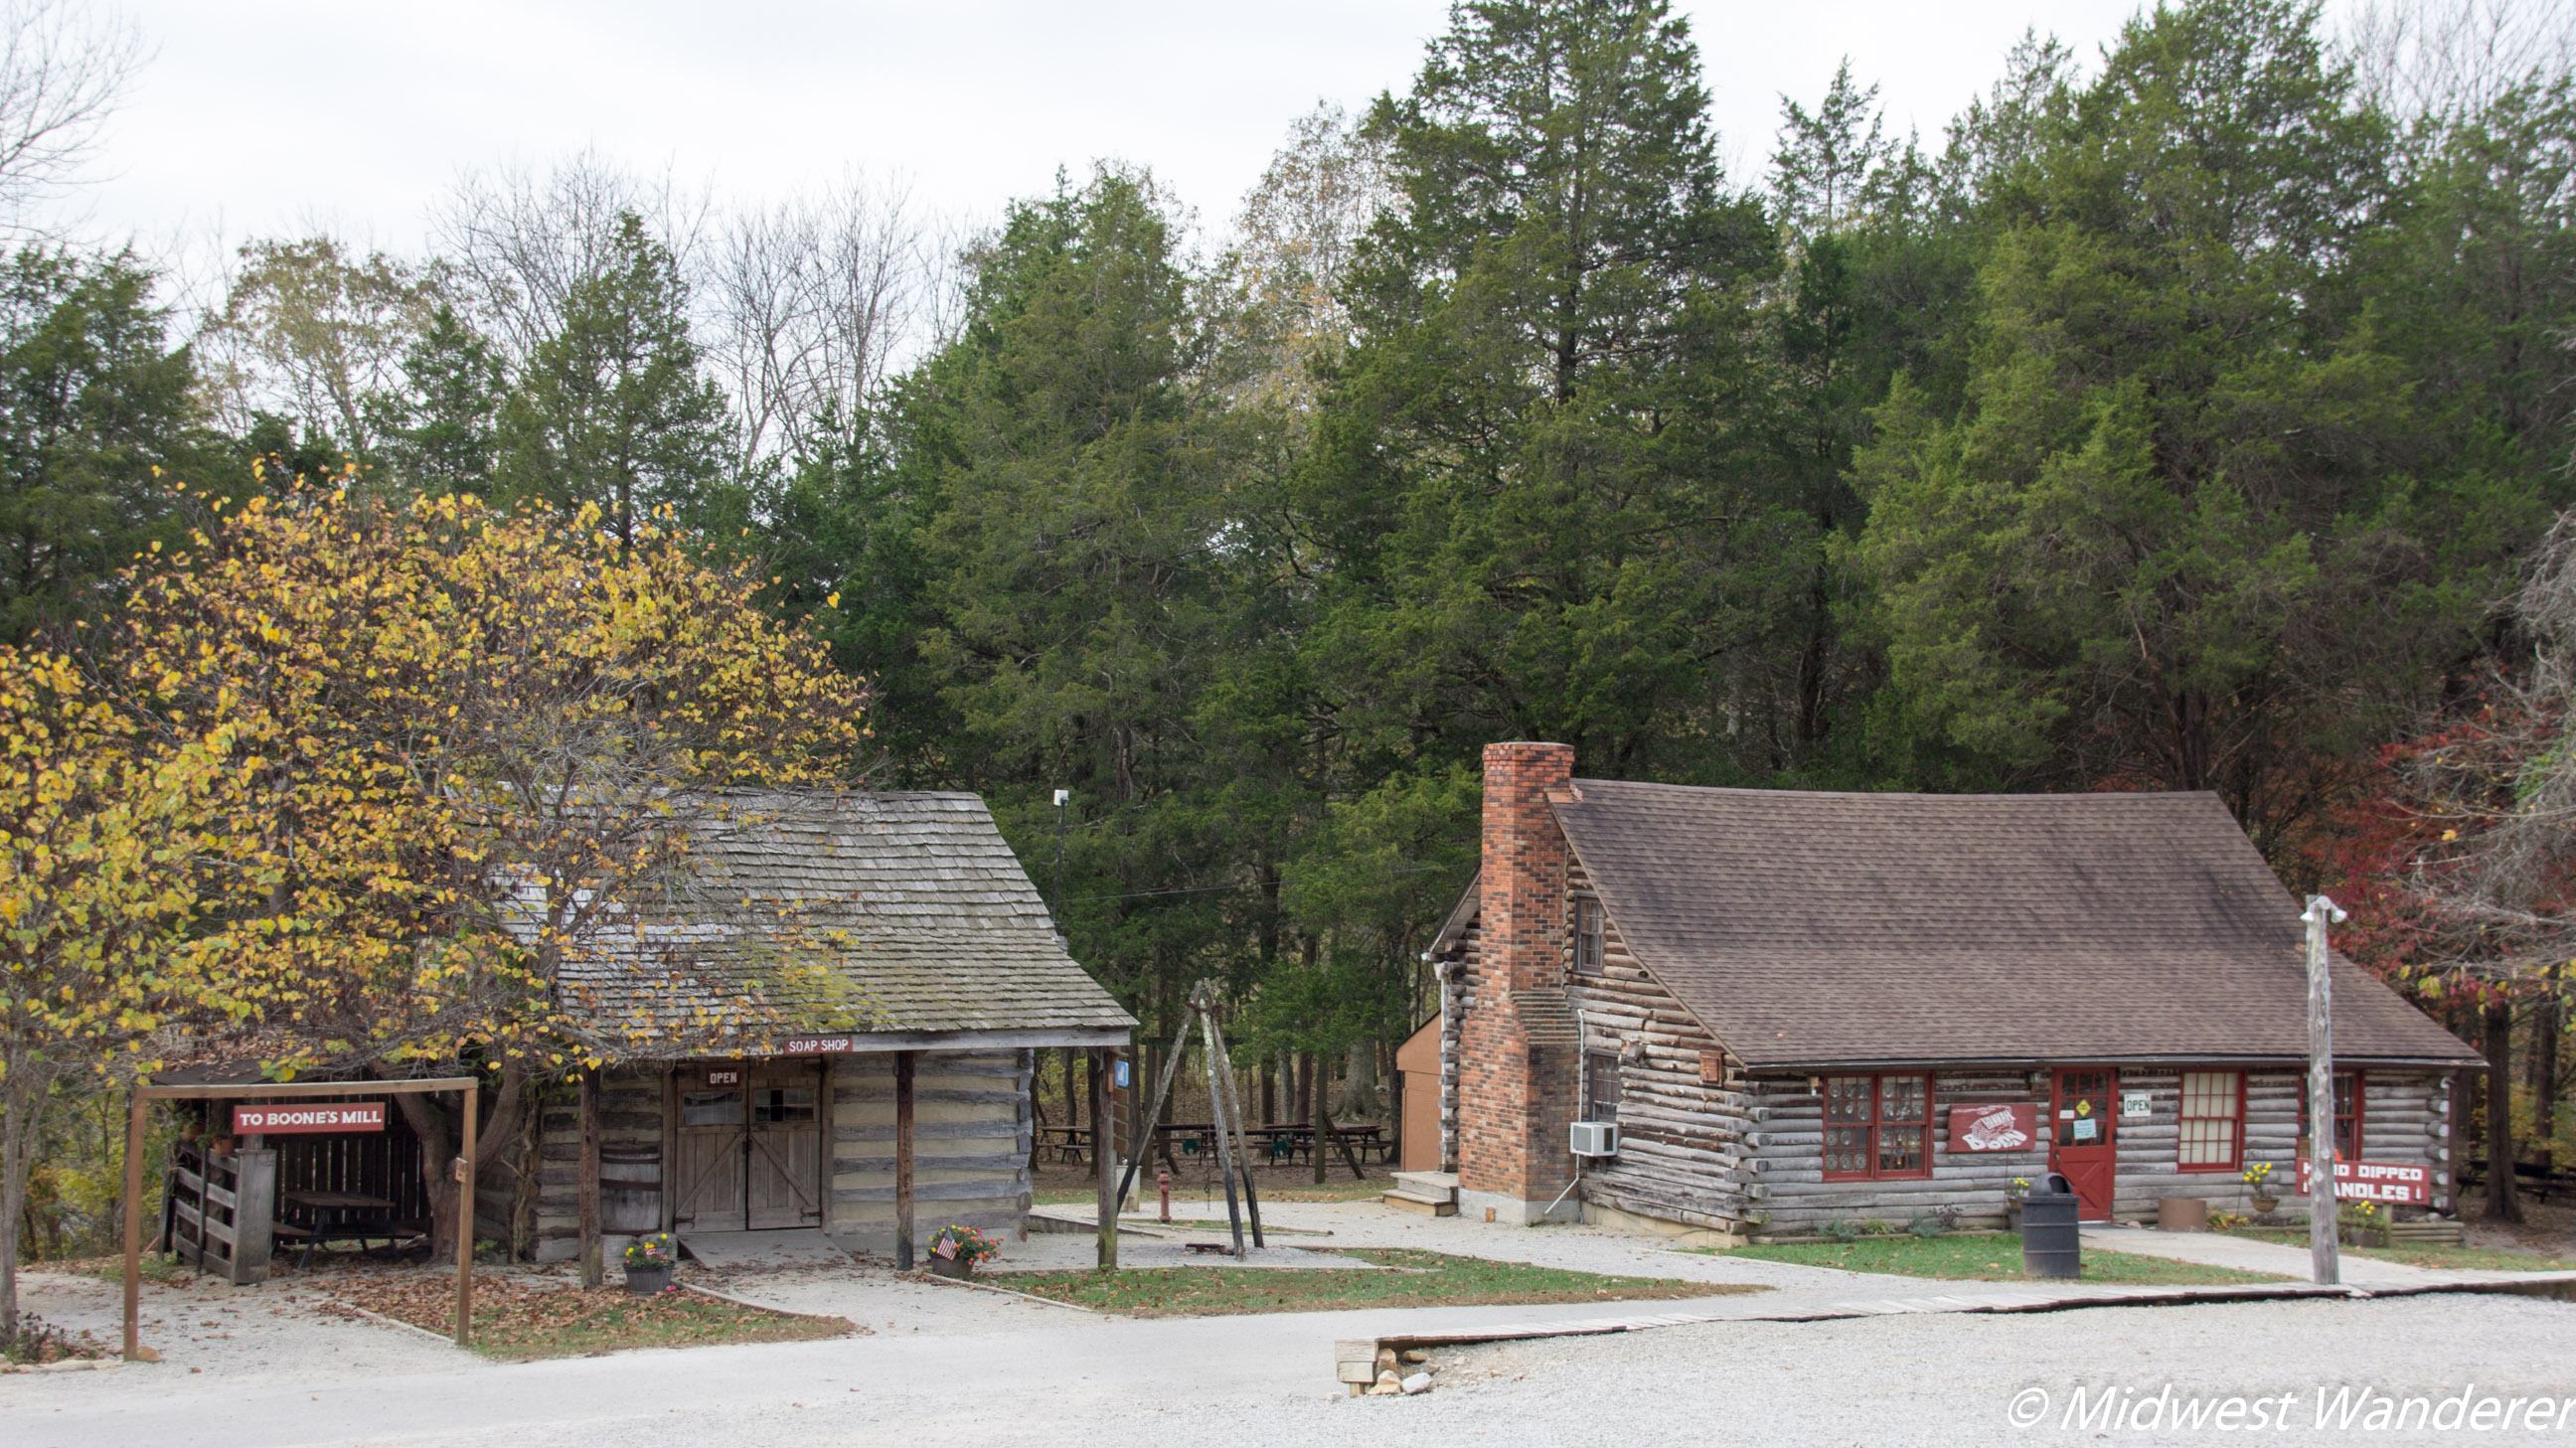 Squire Boone Caverns village